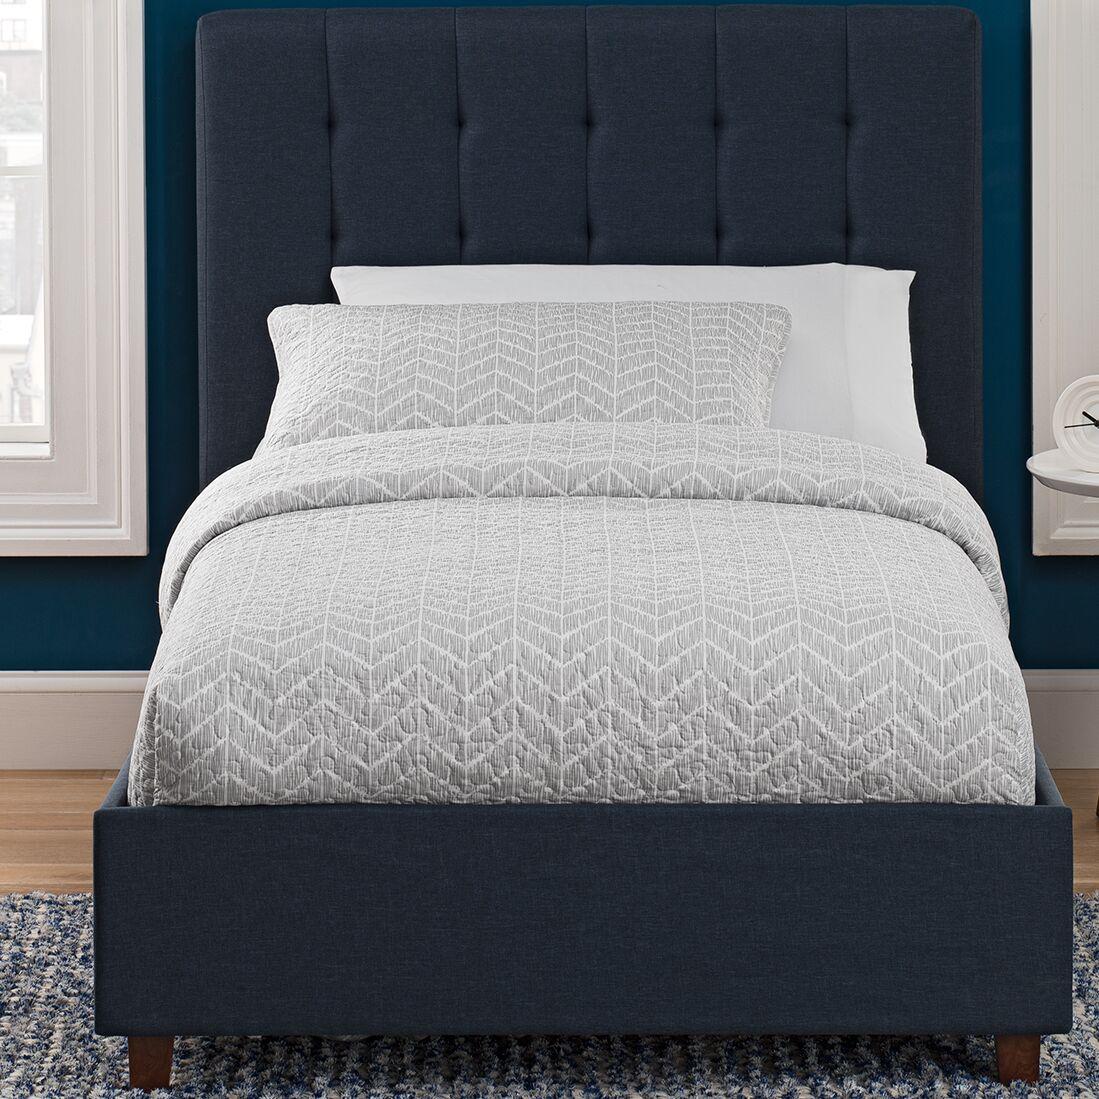 Littrell Upholstered Platform Bed Size: Full, Headboard Color: Blue